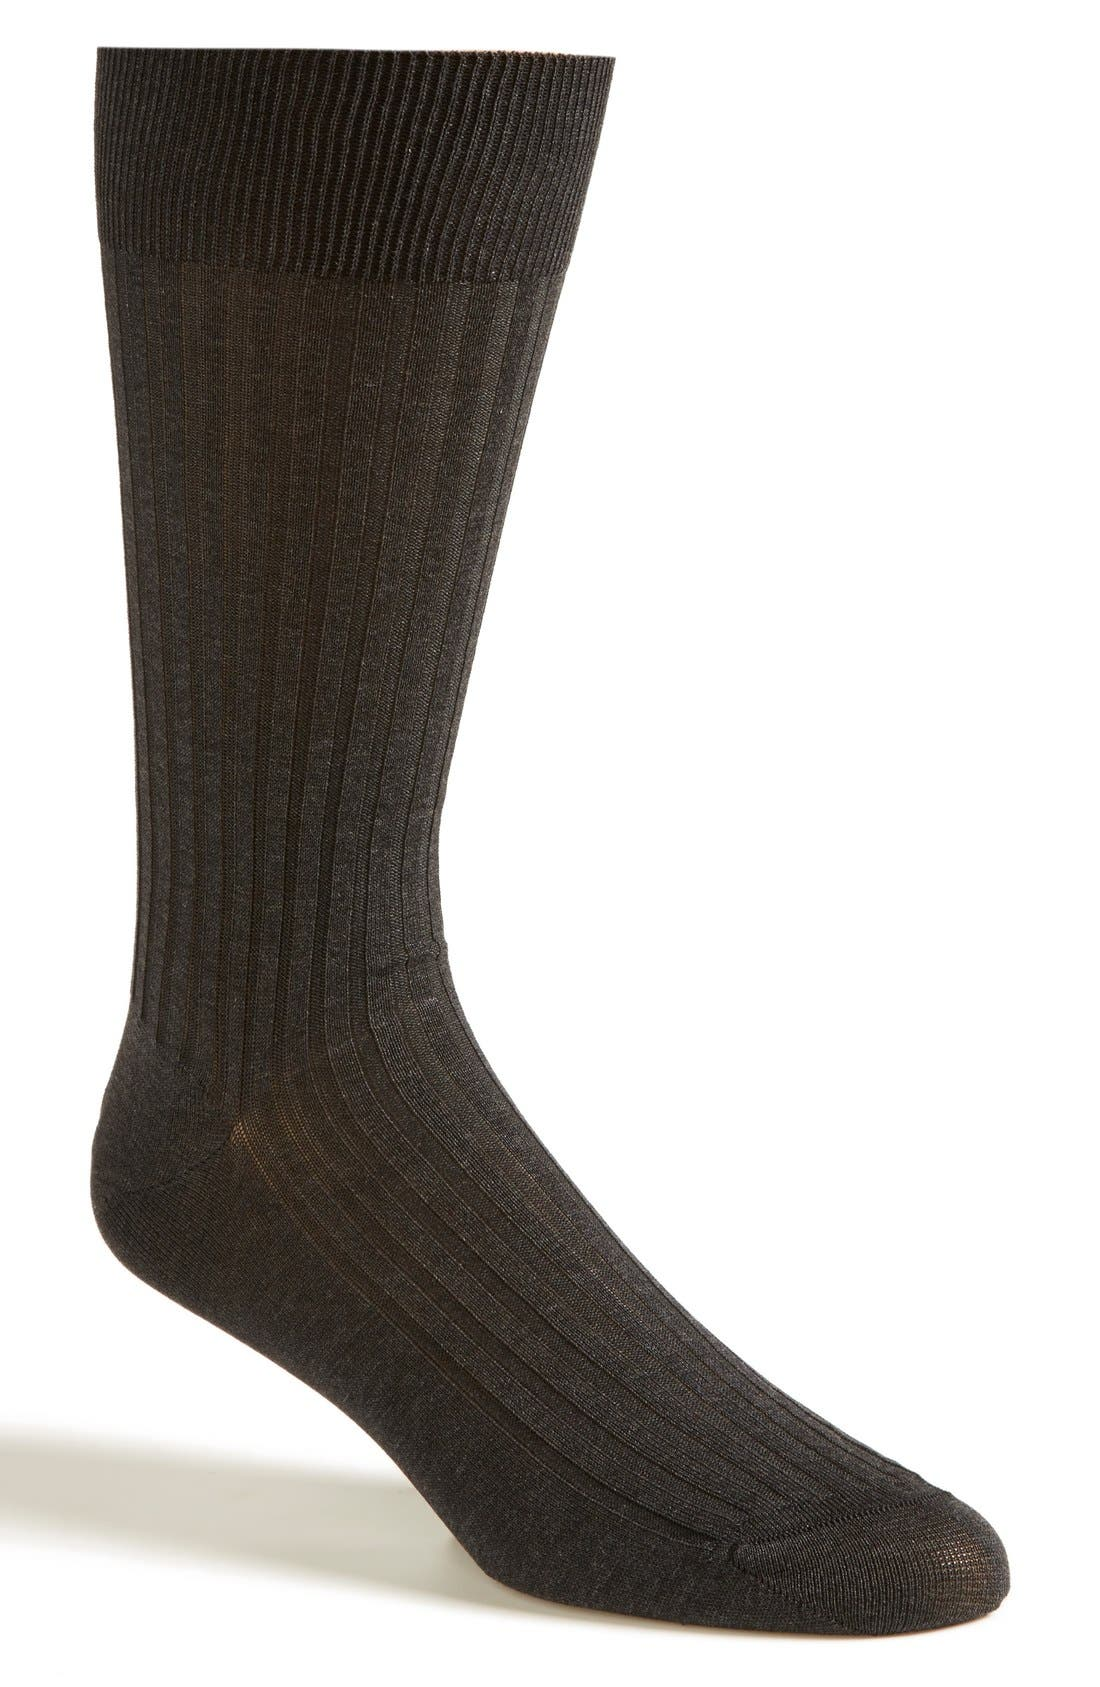 PANTHERELLA Cotton Blend Mid Calf Dress Socks, Main, color, DARK GREY 08